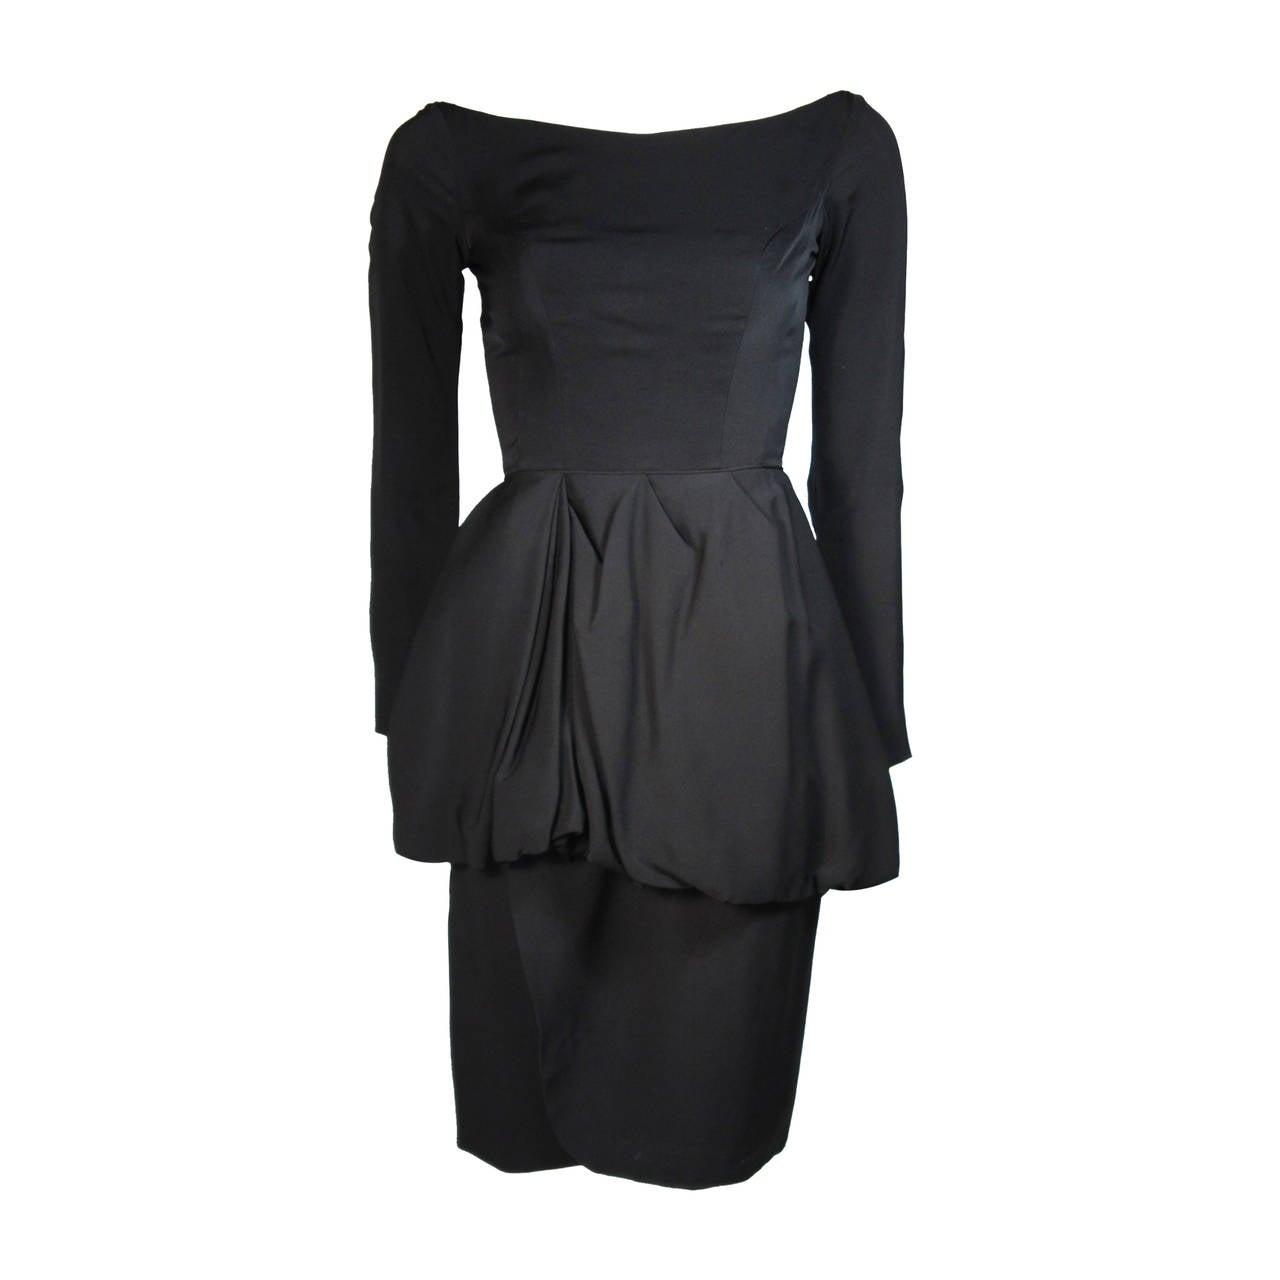 Ceil Chapman Black Draped Princess Seam Peplum Style Waist Dress Size XS 1